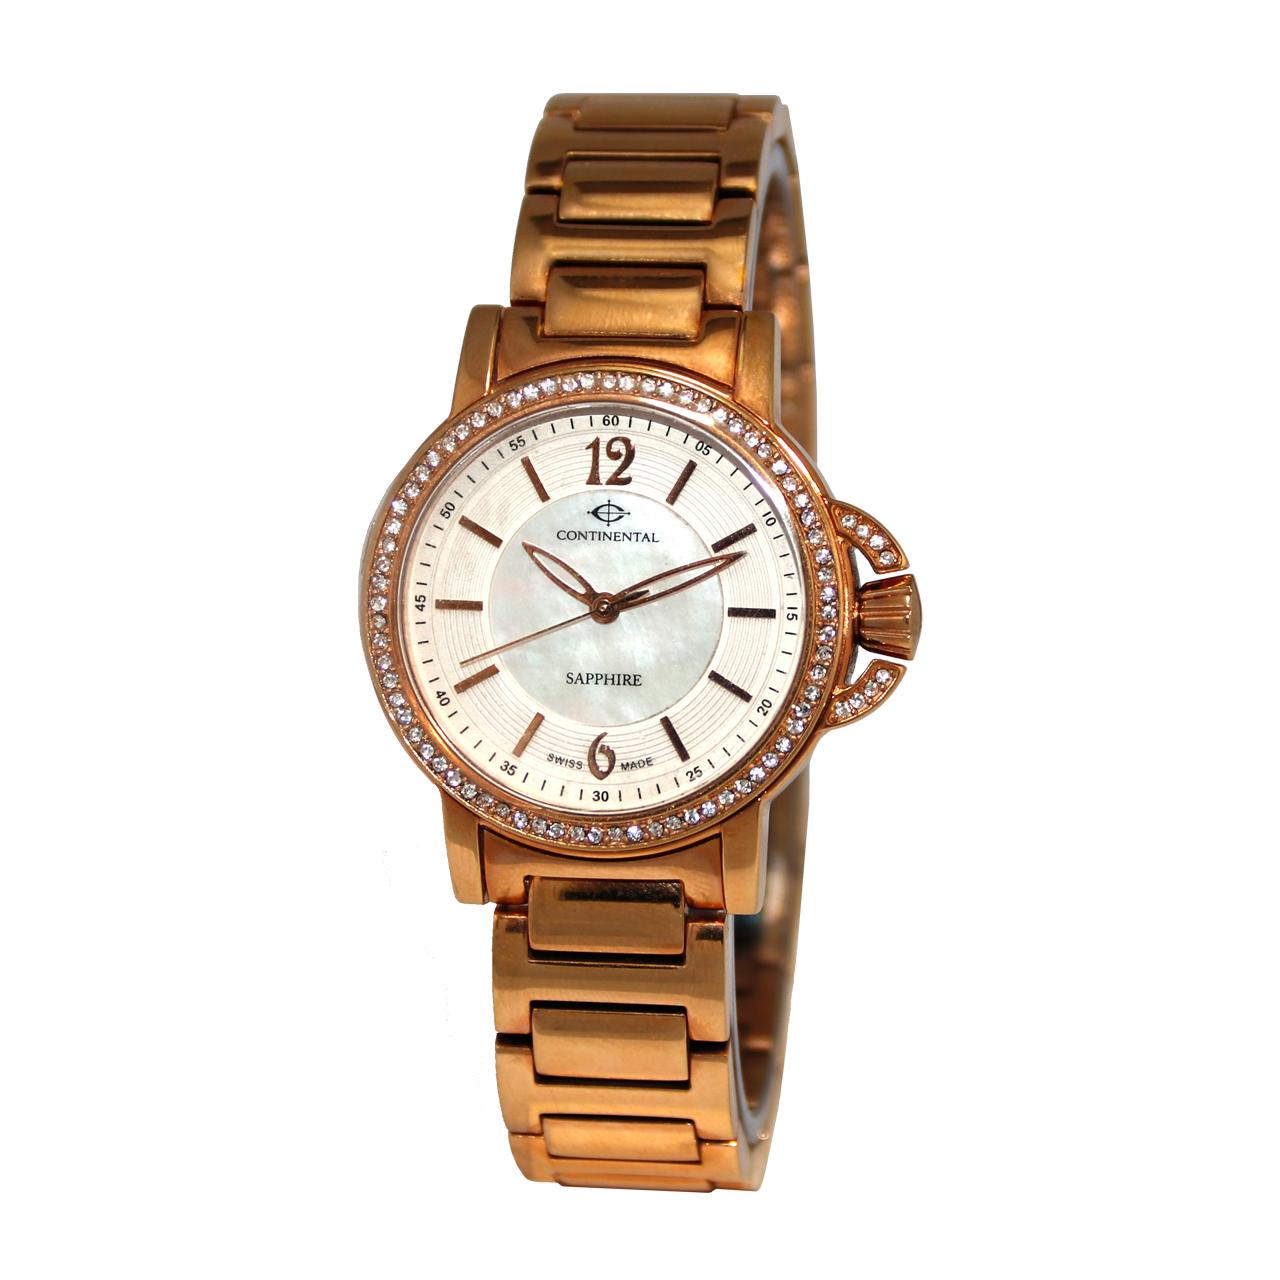 ساعت زنانه برند کنتیننتال مدل 265D-12260